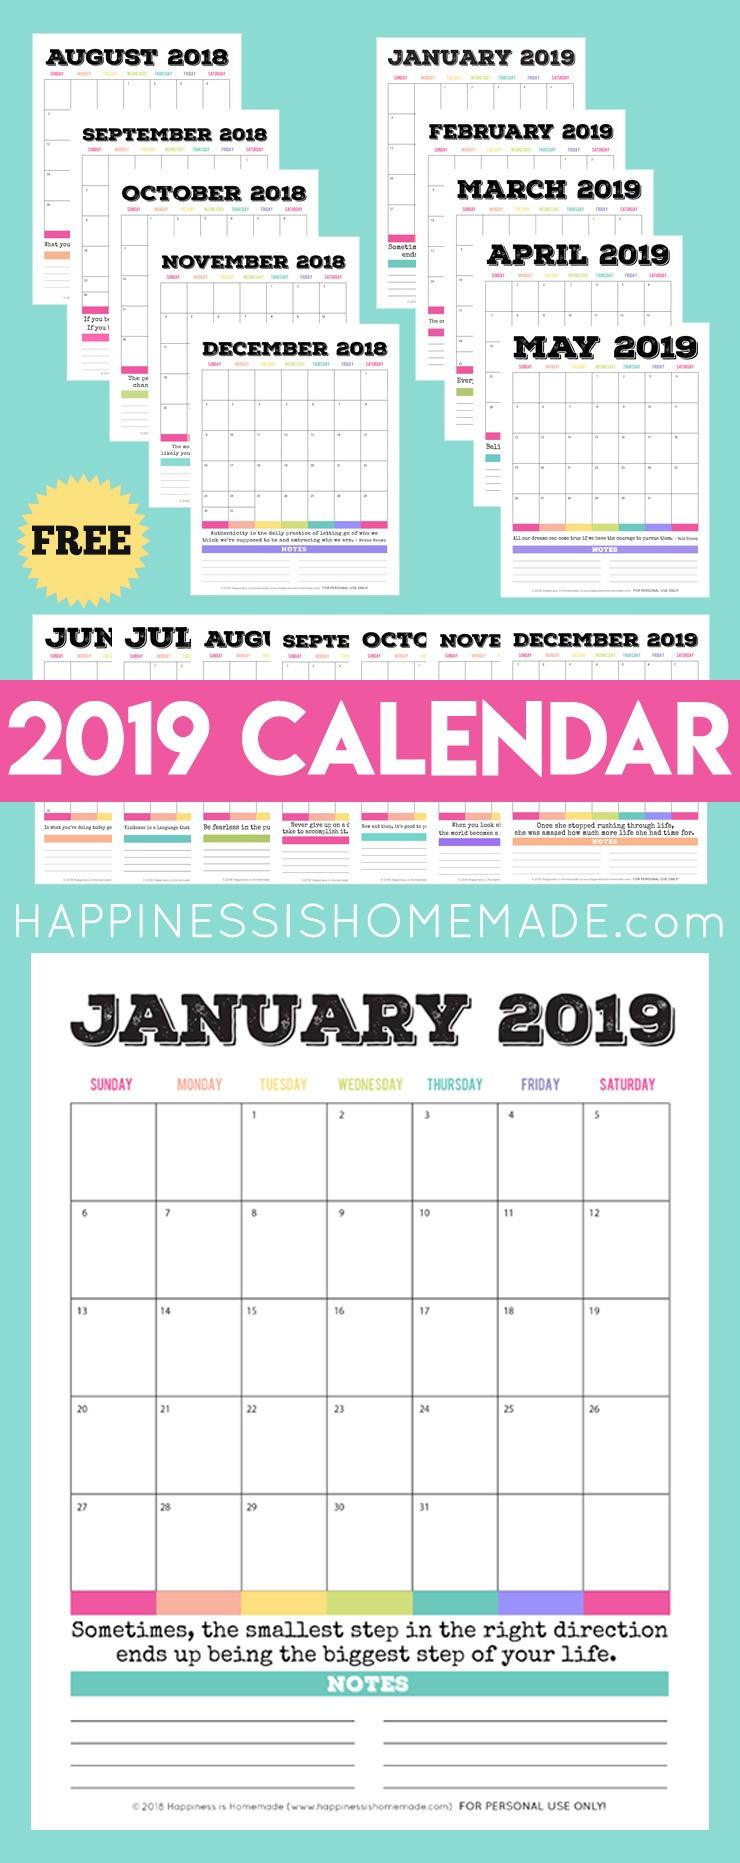 Free Printable 2019 Monthly Calendar 2019 Free Printable Calendar Printable Monthly Calendar